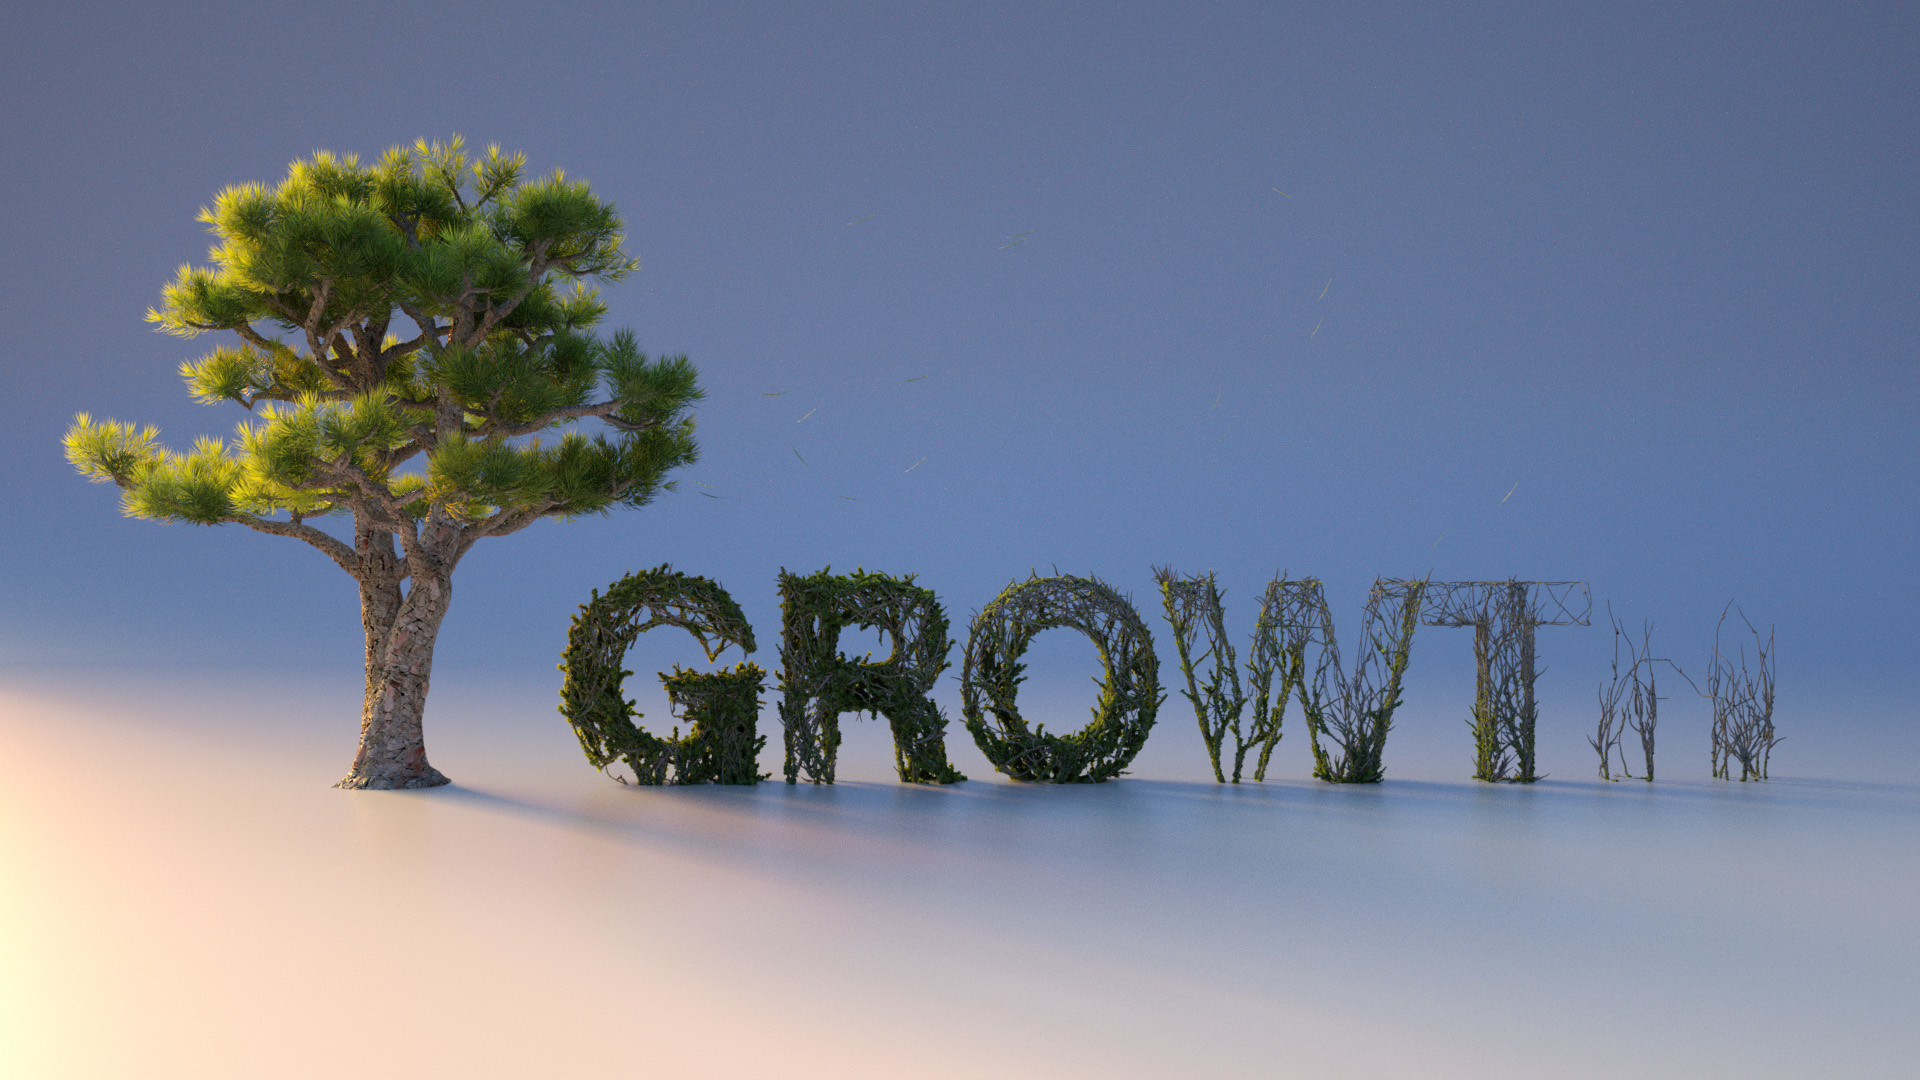 Coen brasser scene01 growth closeup02 0 00 06 01